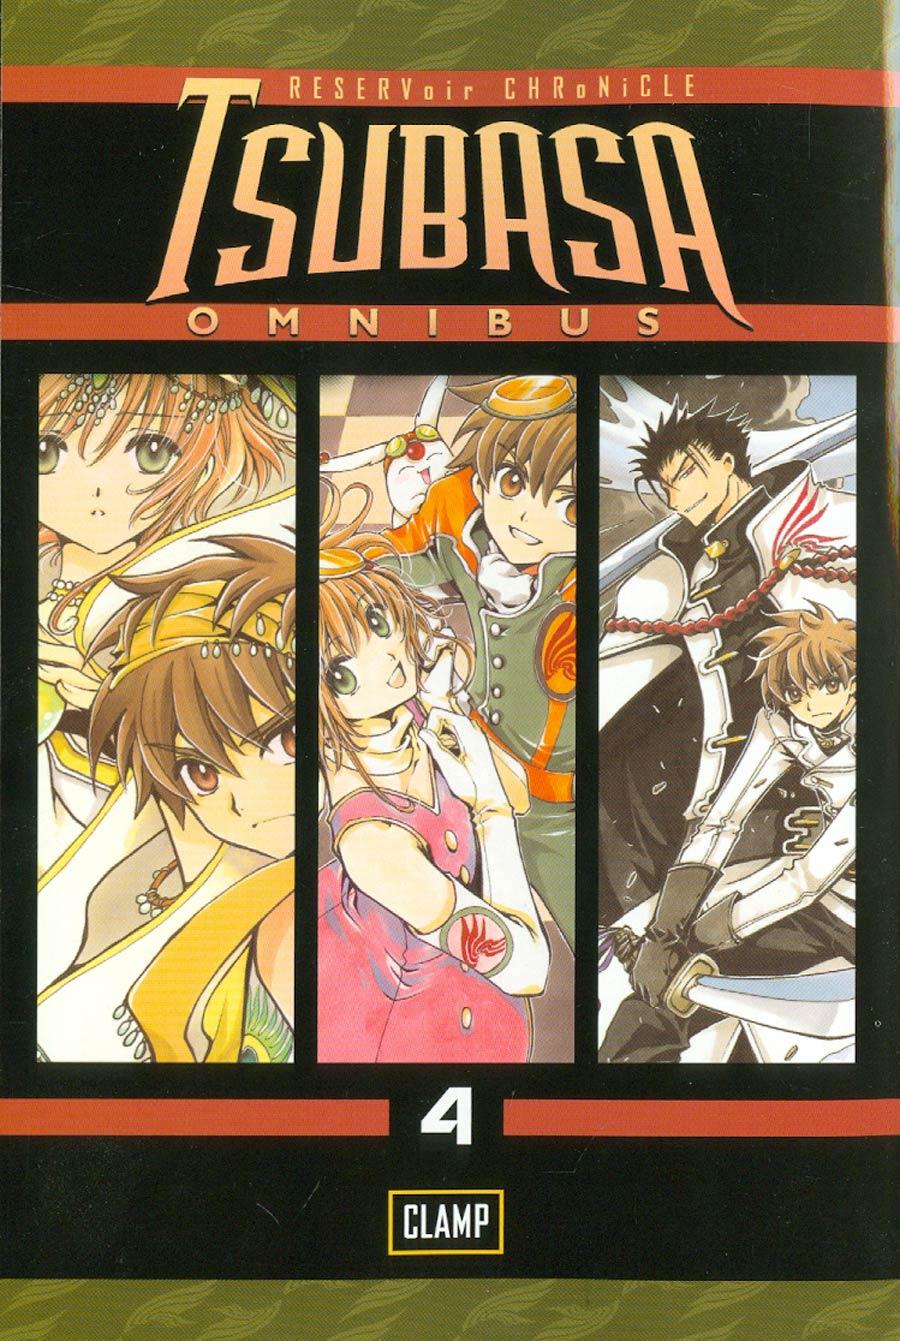 Tsubasa Omnibus Vol 4 GN